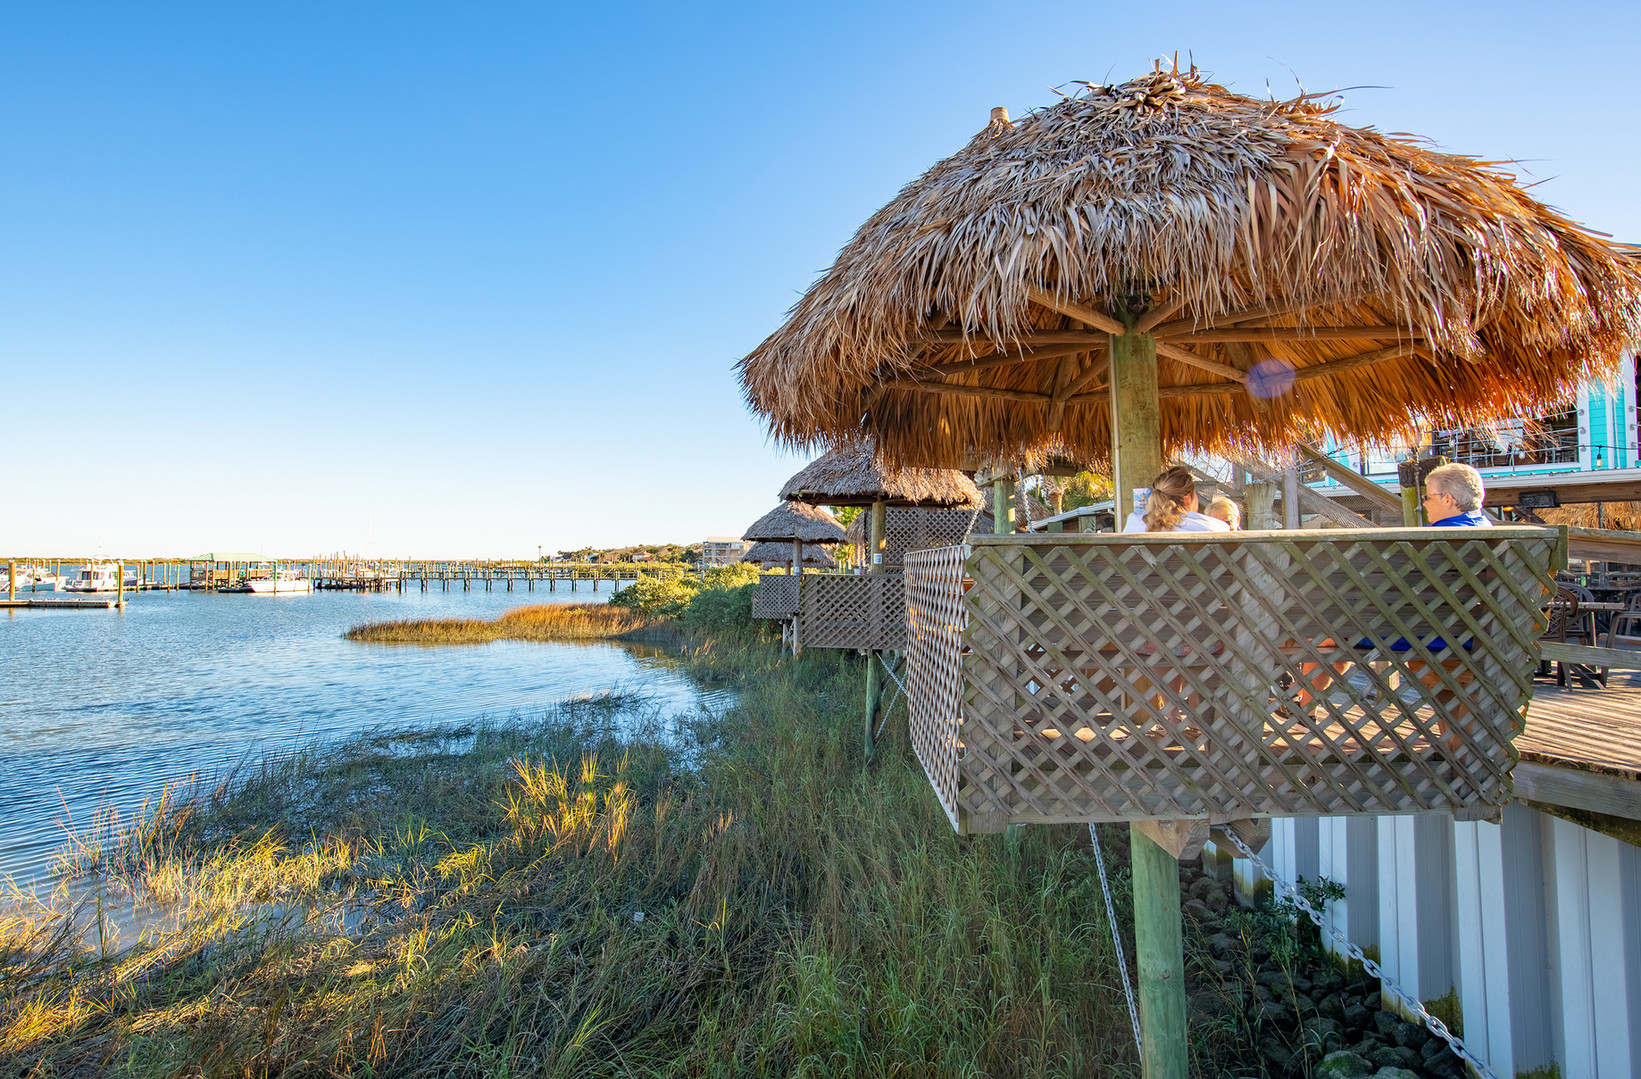 Conch House Marina Restaurant hut